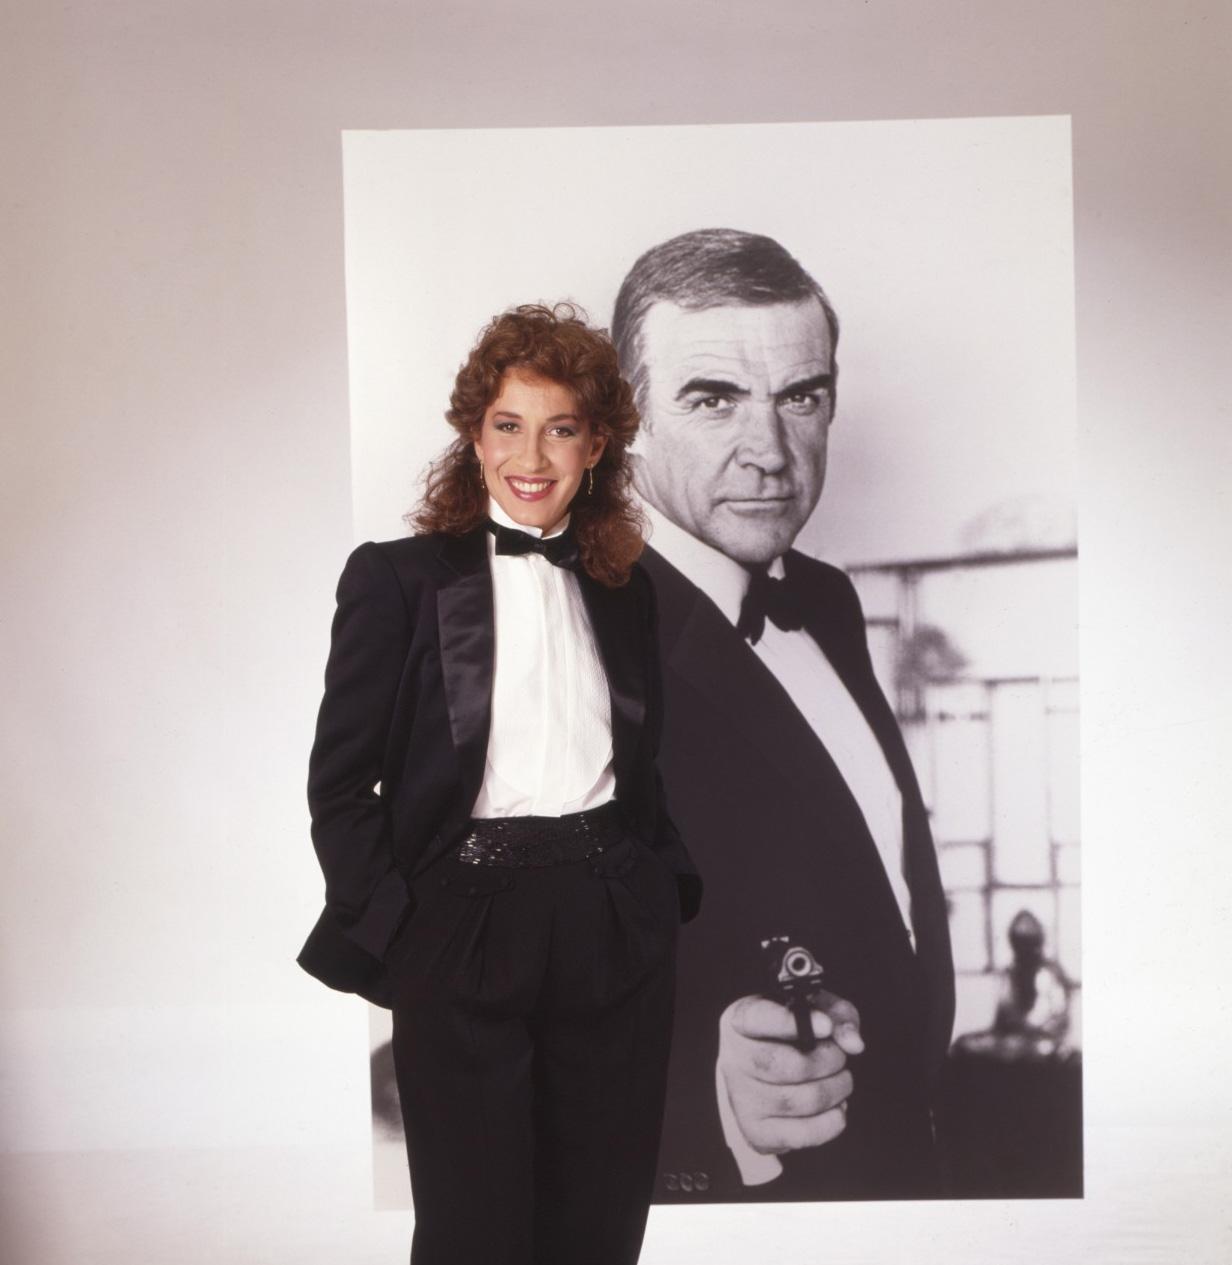 Lani Hall Alpert - James Bond Theme Song